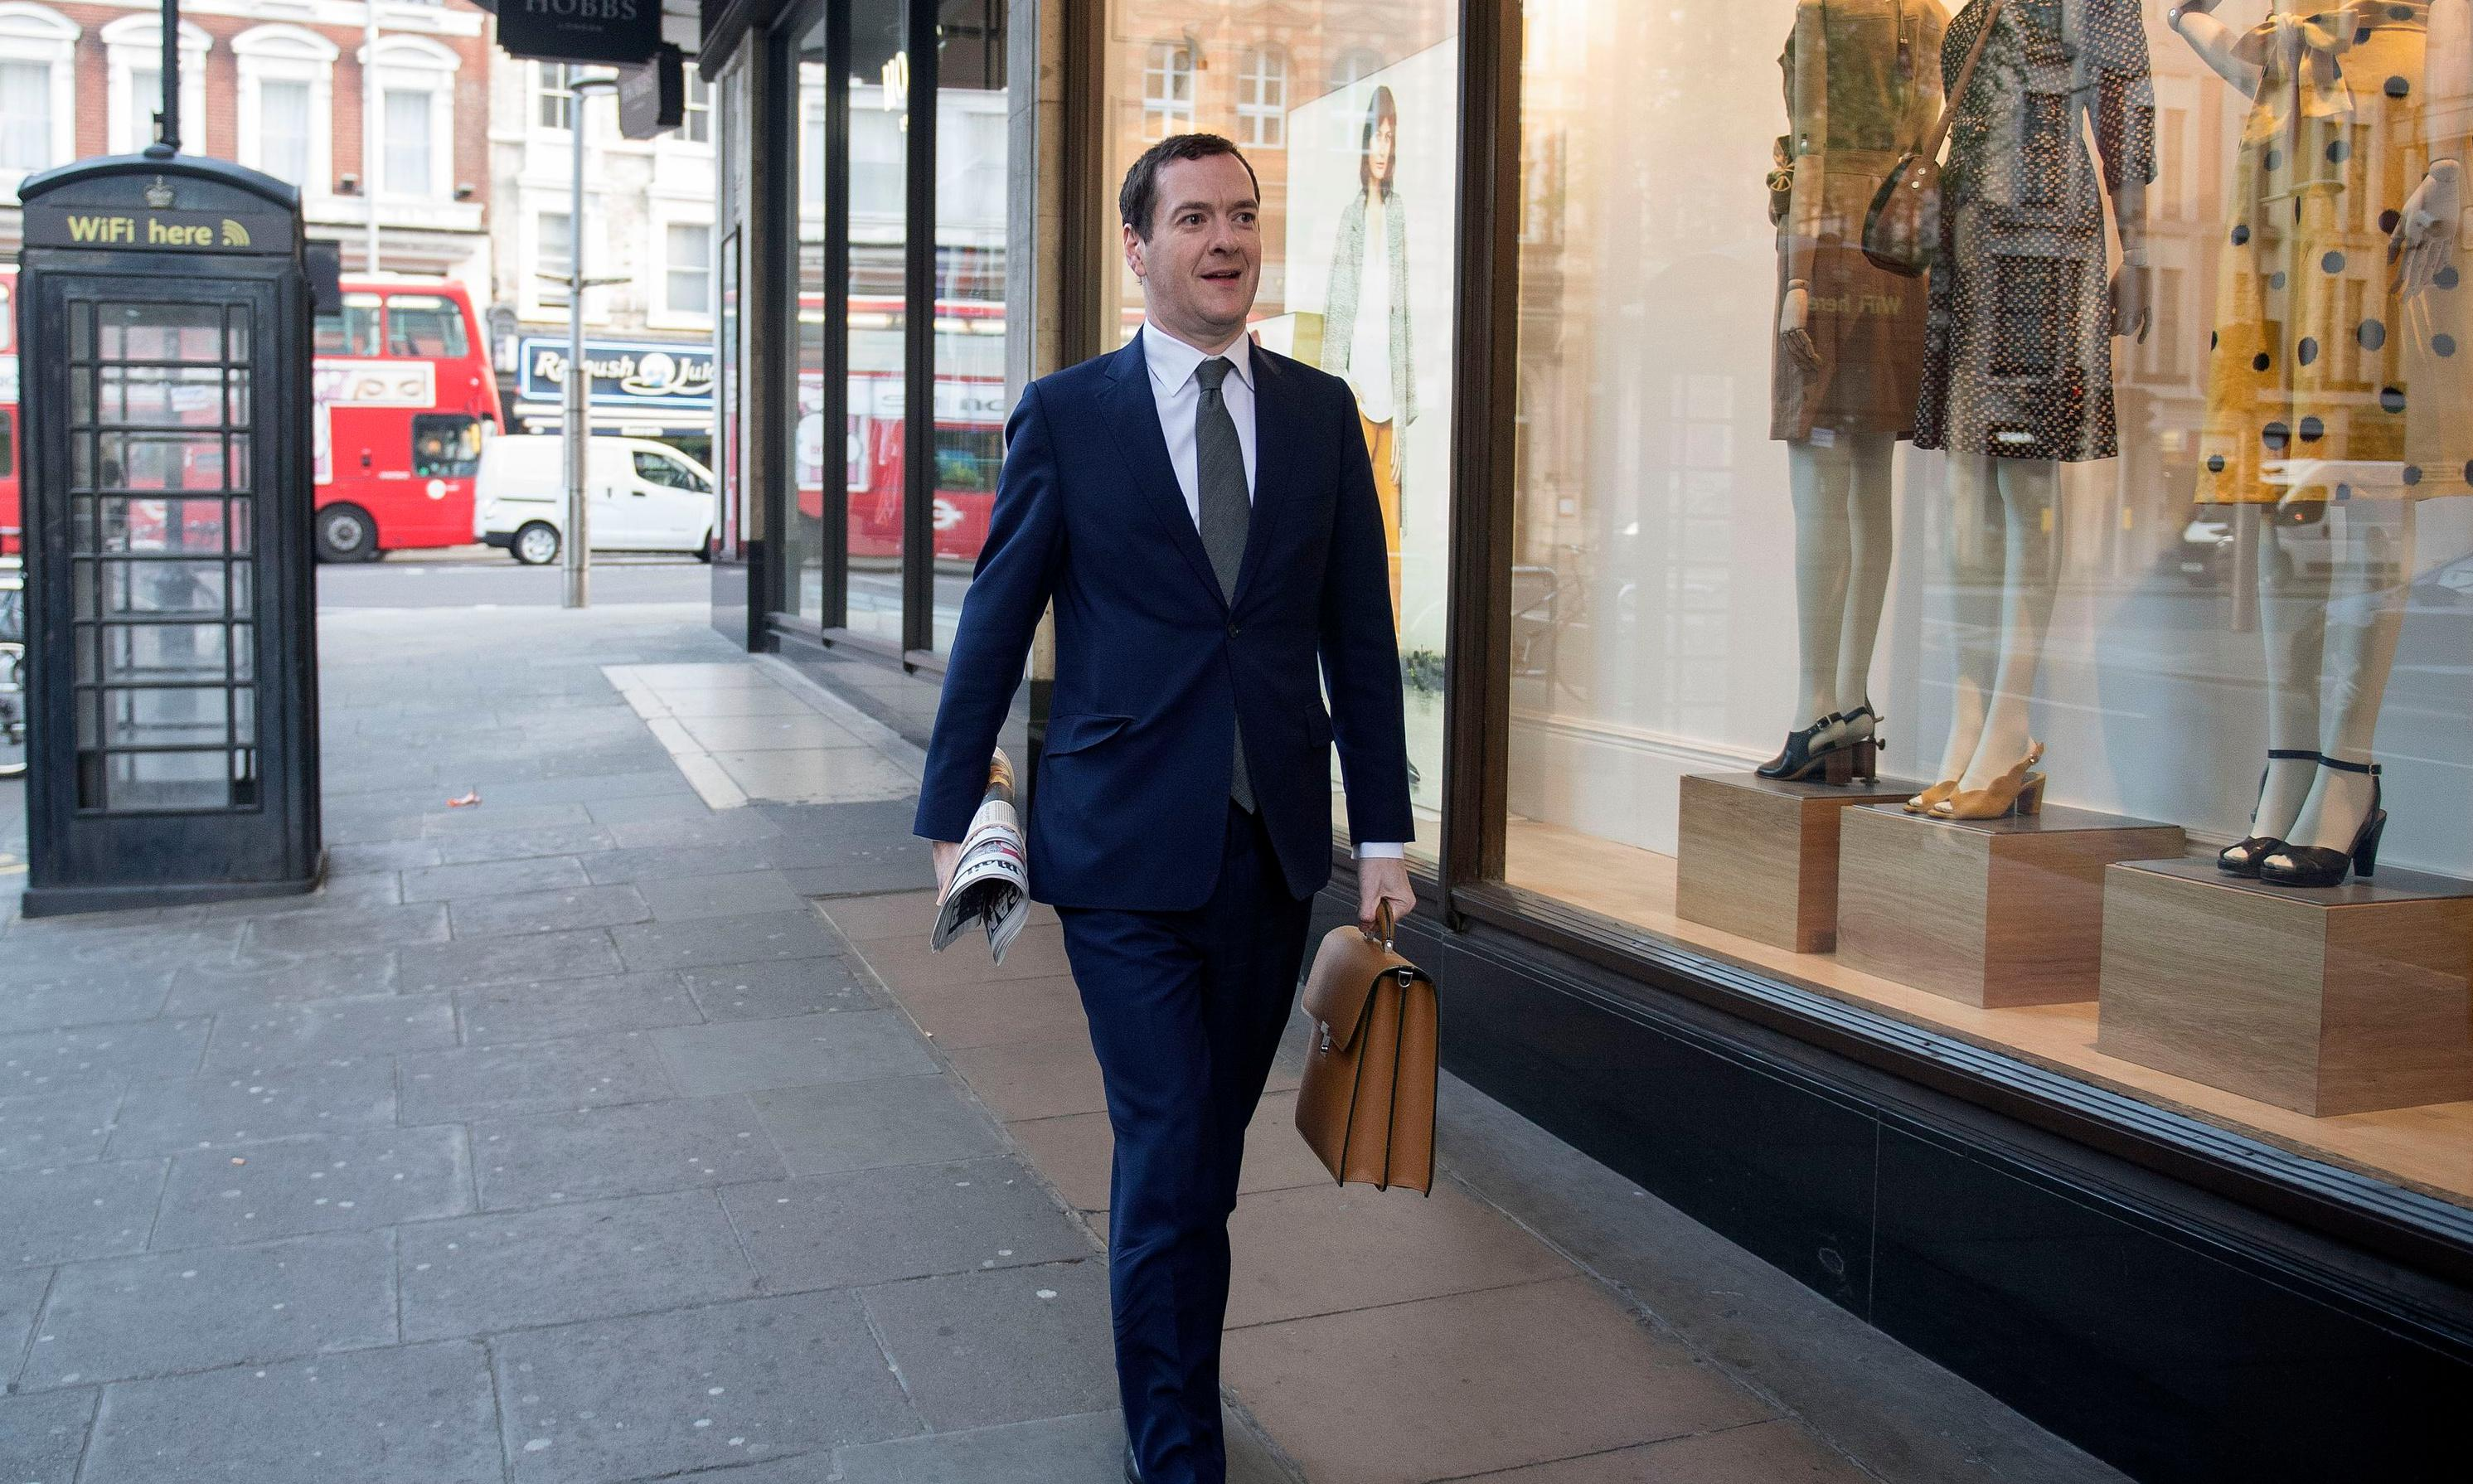 George Osborne's Evening Standard backs Lib Dems for EU elections